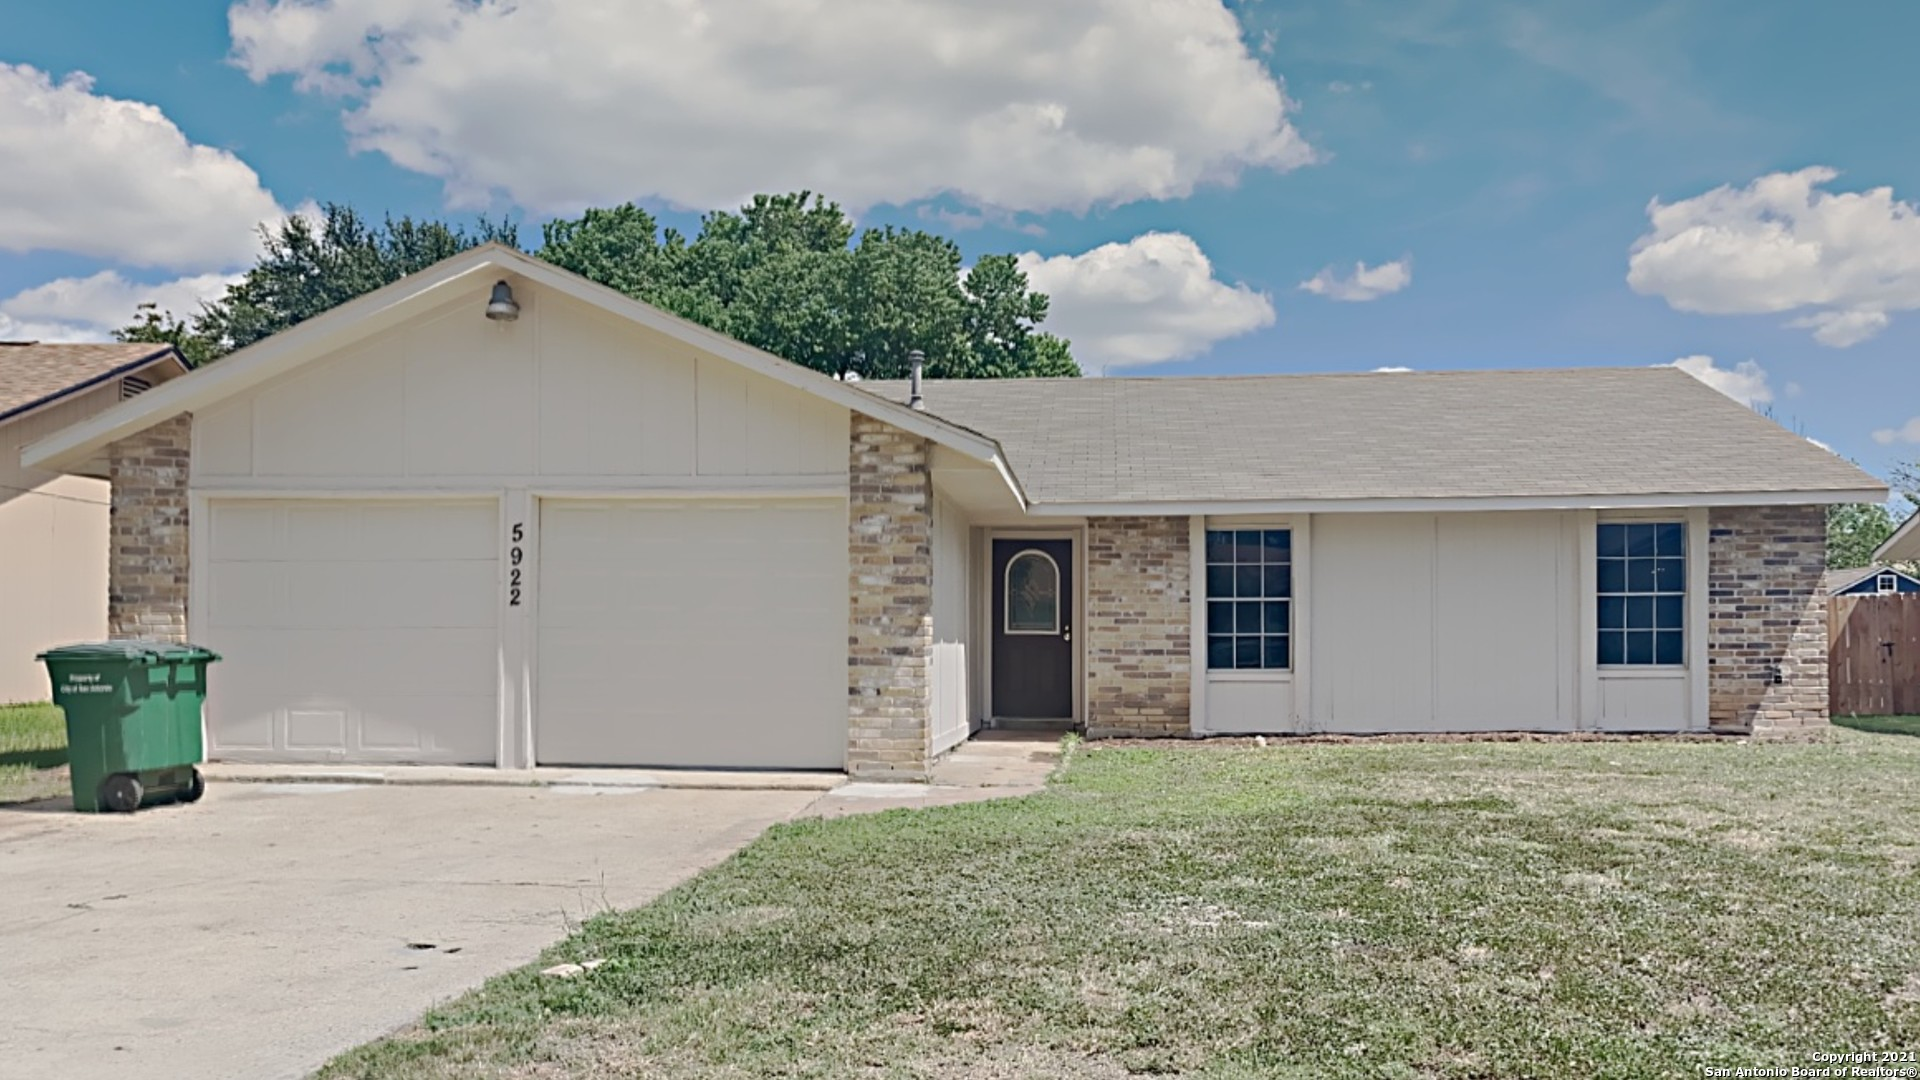 5922 VALLEY BRANCH ST, San Antonio, TX 78250